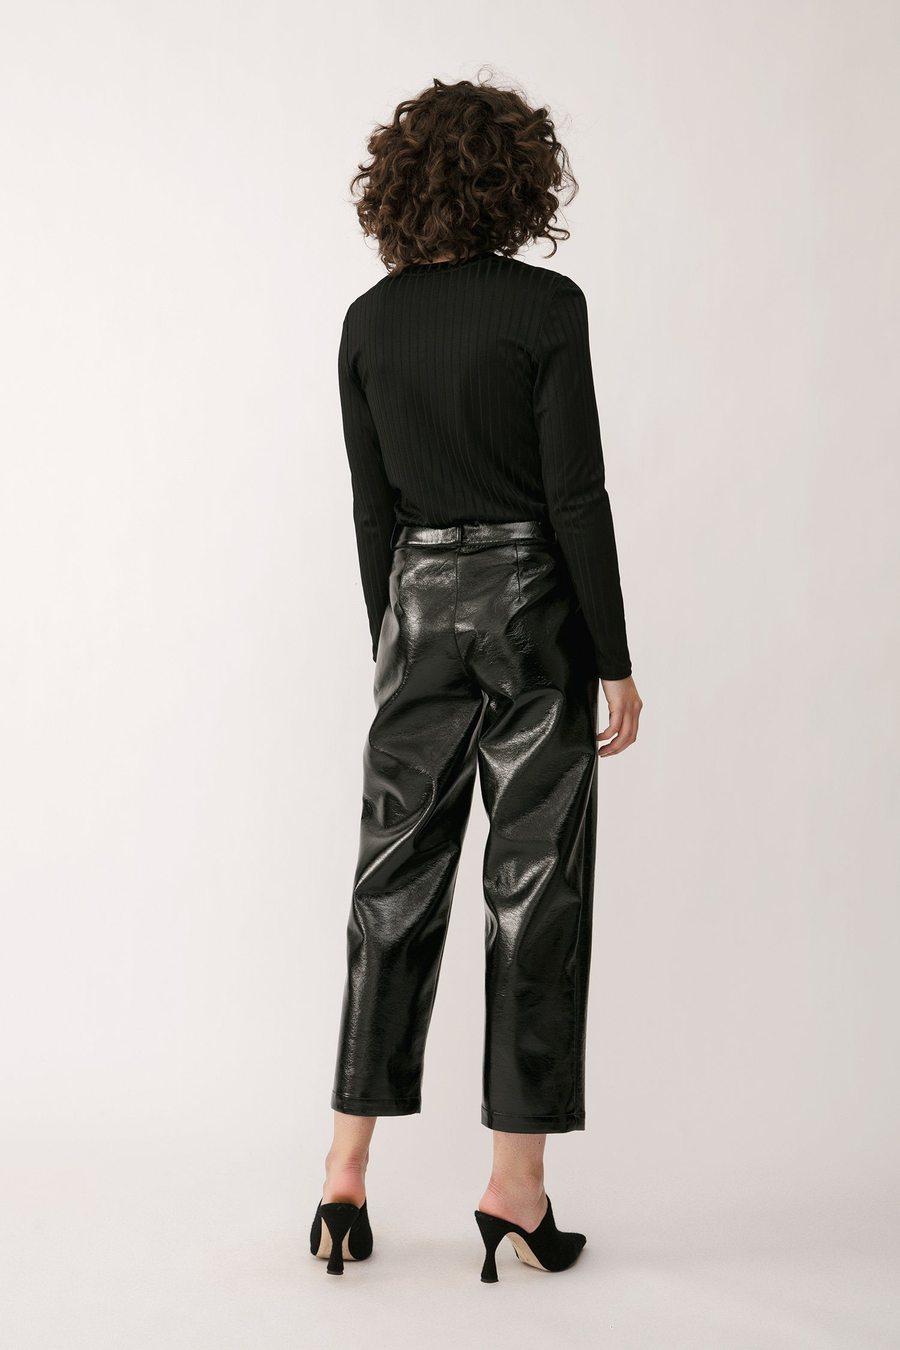 verde-trousers-black-trousers-stylein-897281_900x.jpg